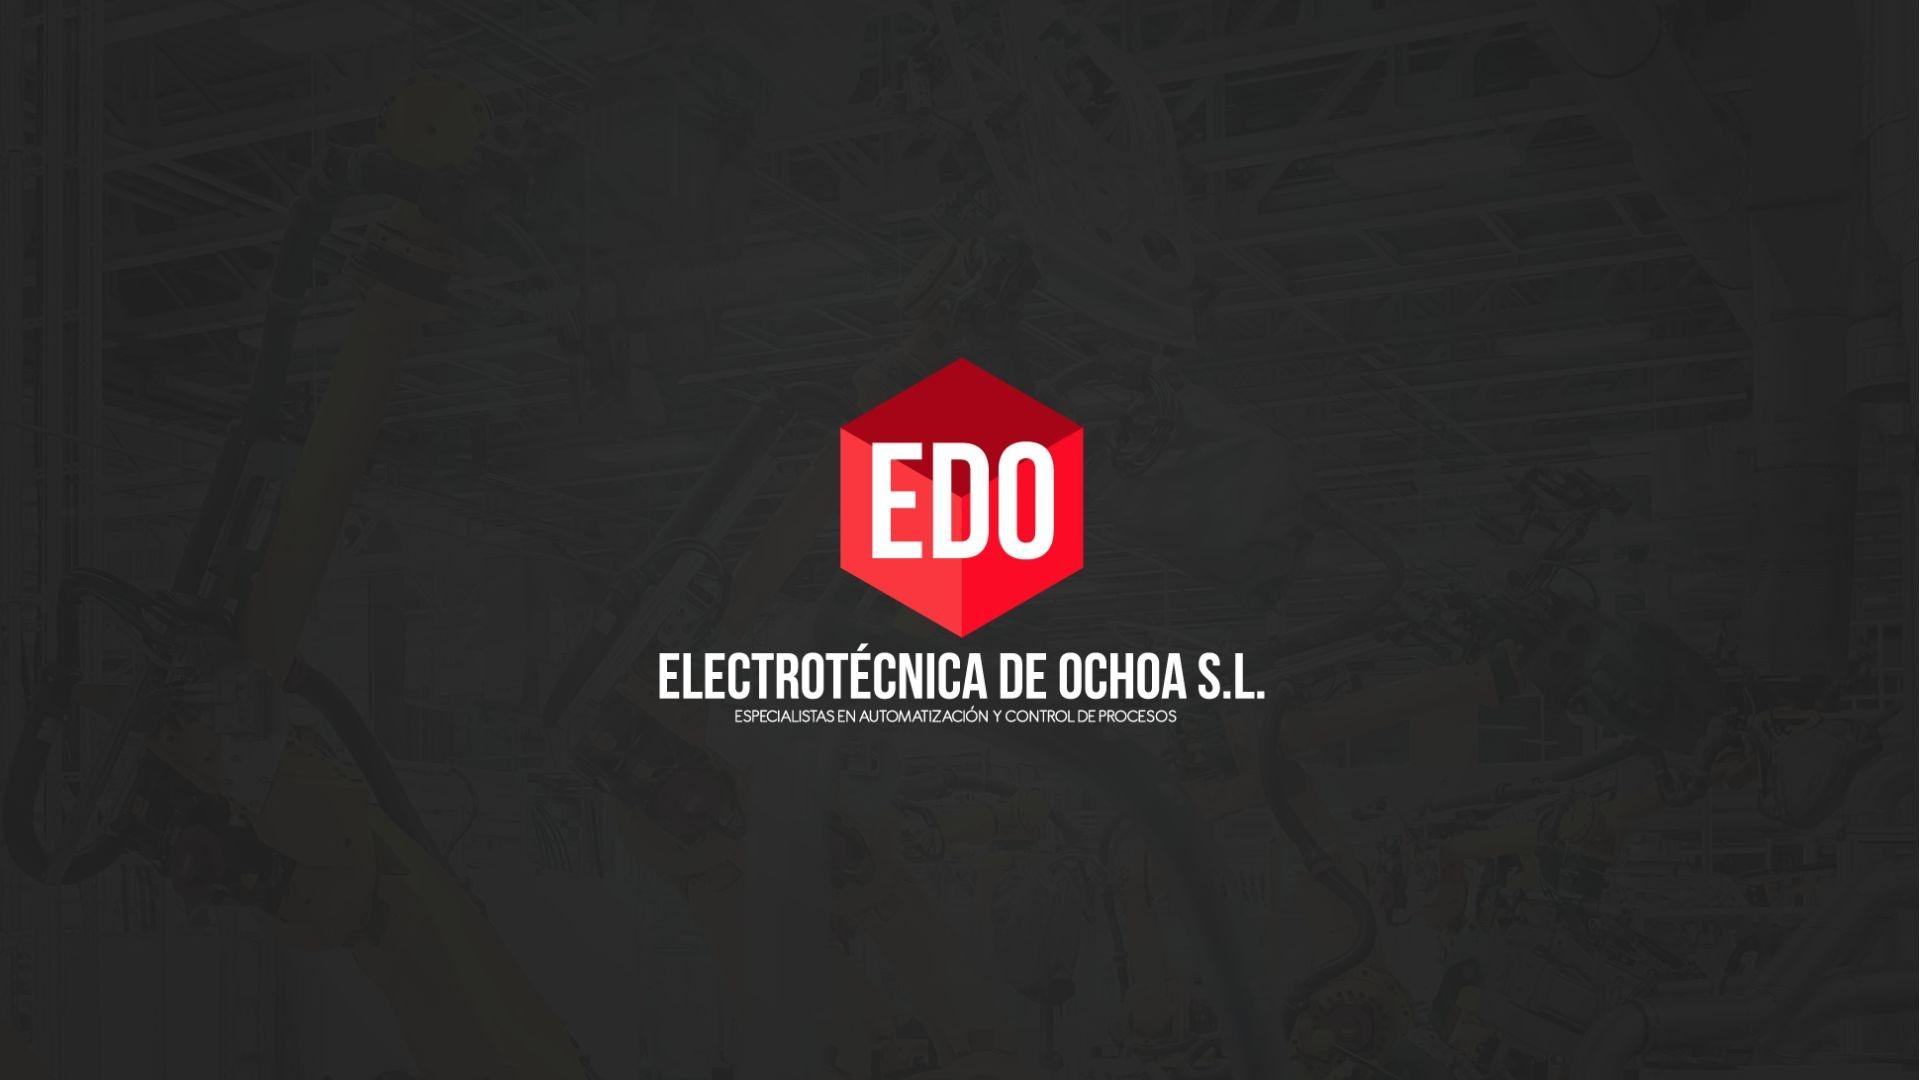 EDO-01